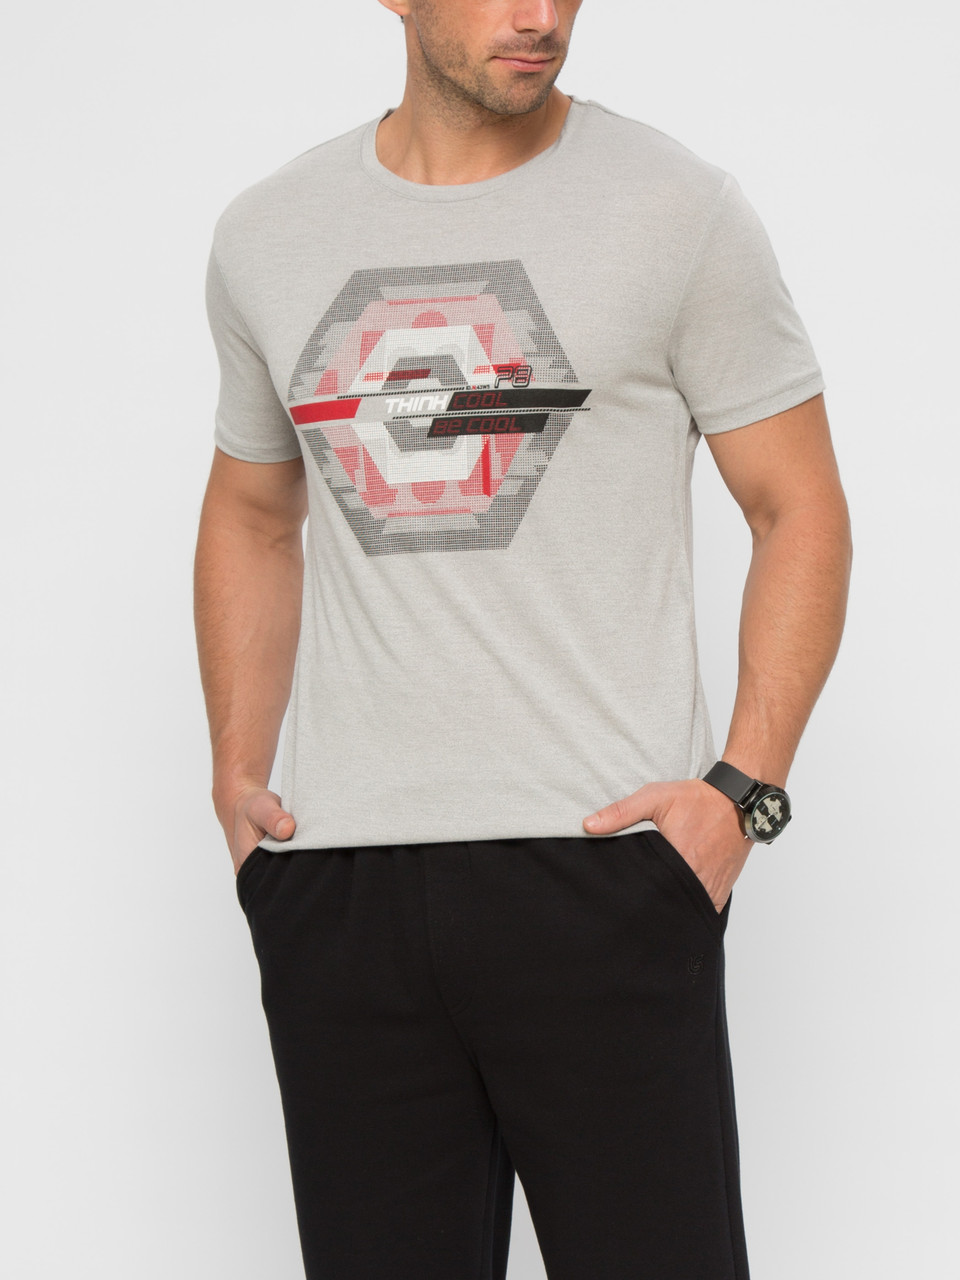 Серая мужская футболка Lc Waikiki / Лс Вайкики с надписью Think cool be cool